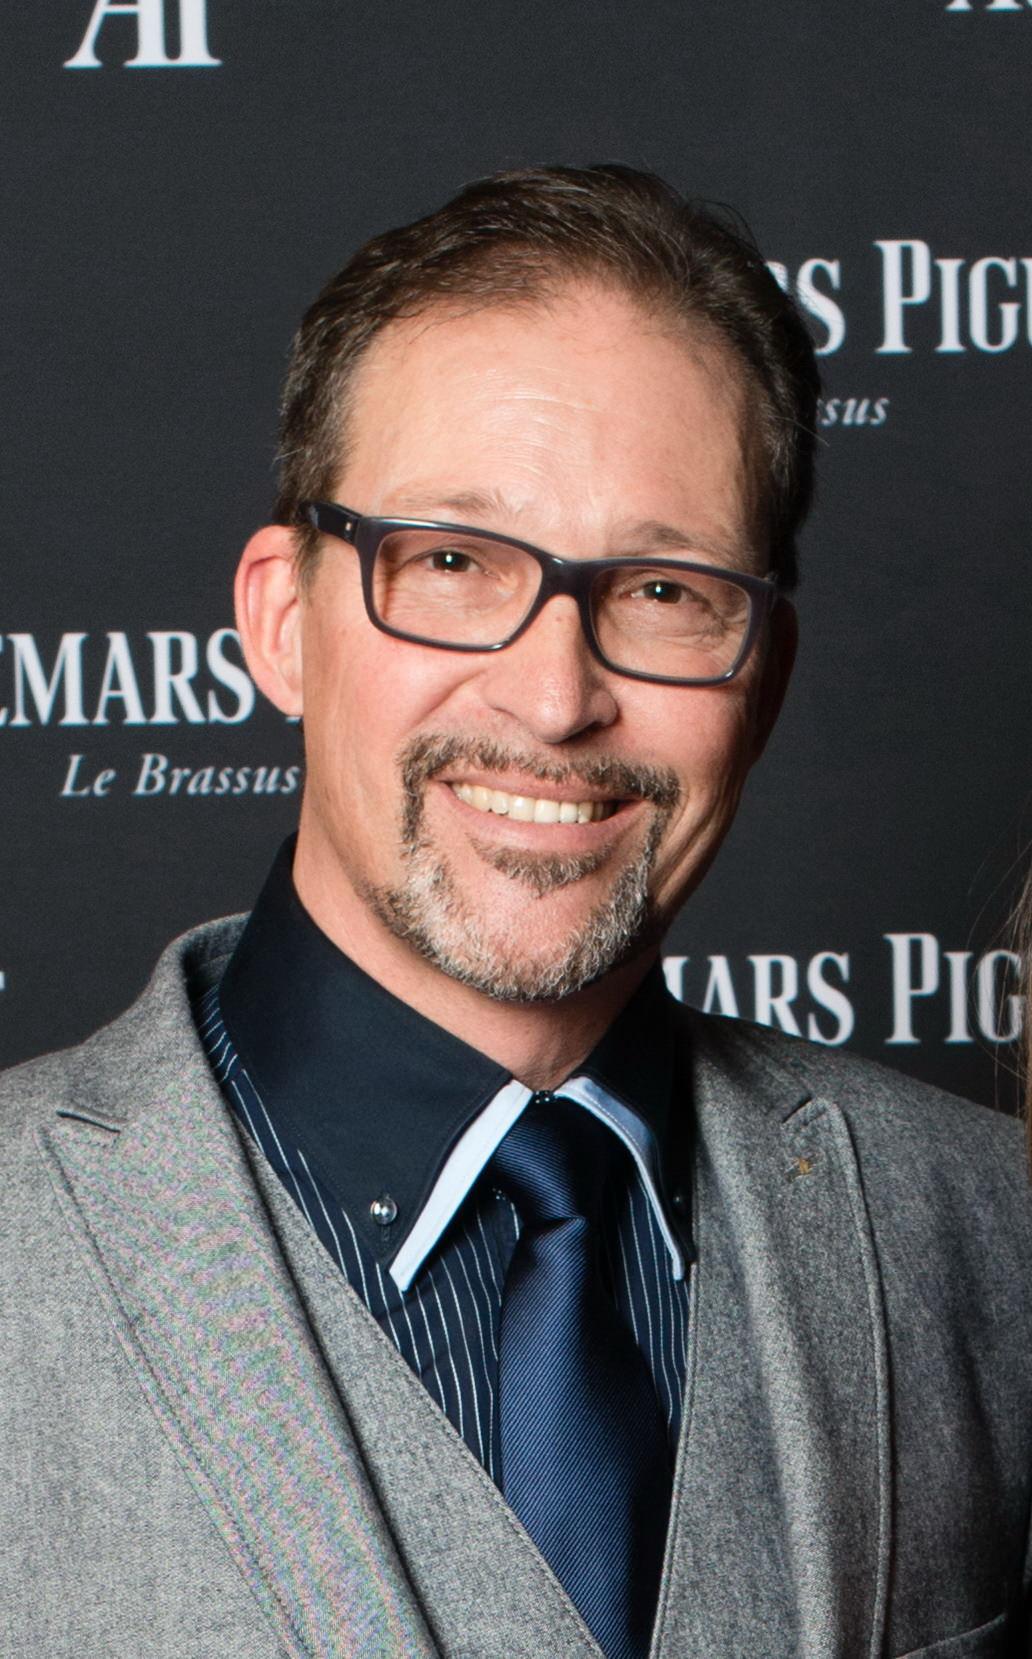 Christophe Guhl, Senior Product Content Specialist bei Audemars Piguet